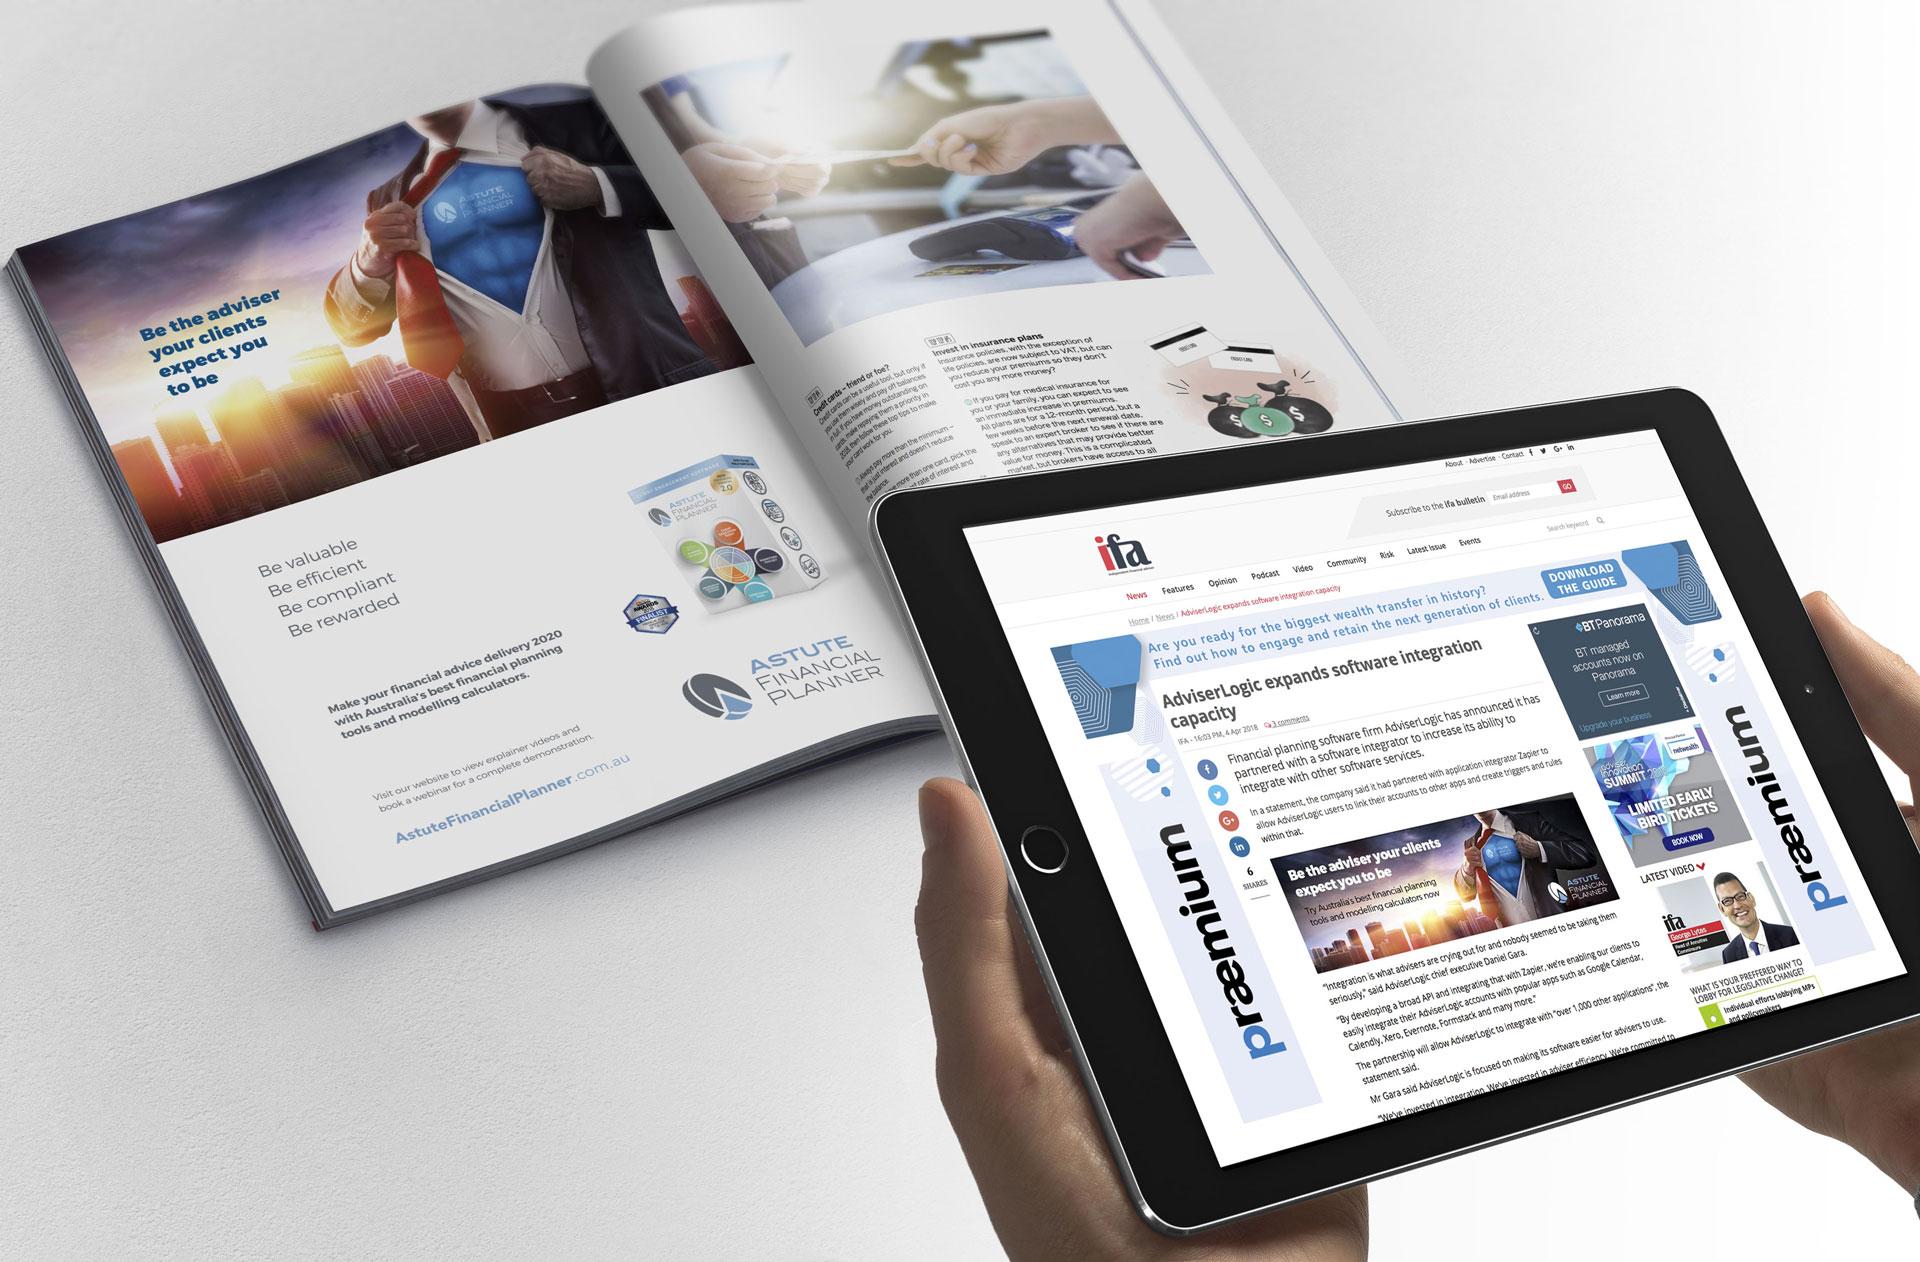 Print Advertising and Digital Advertising Camapaign